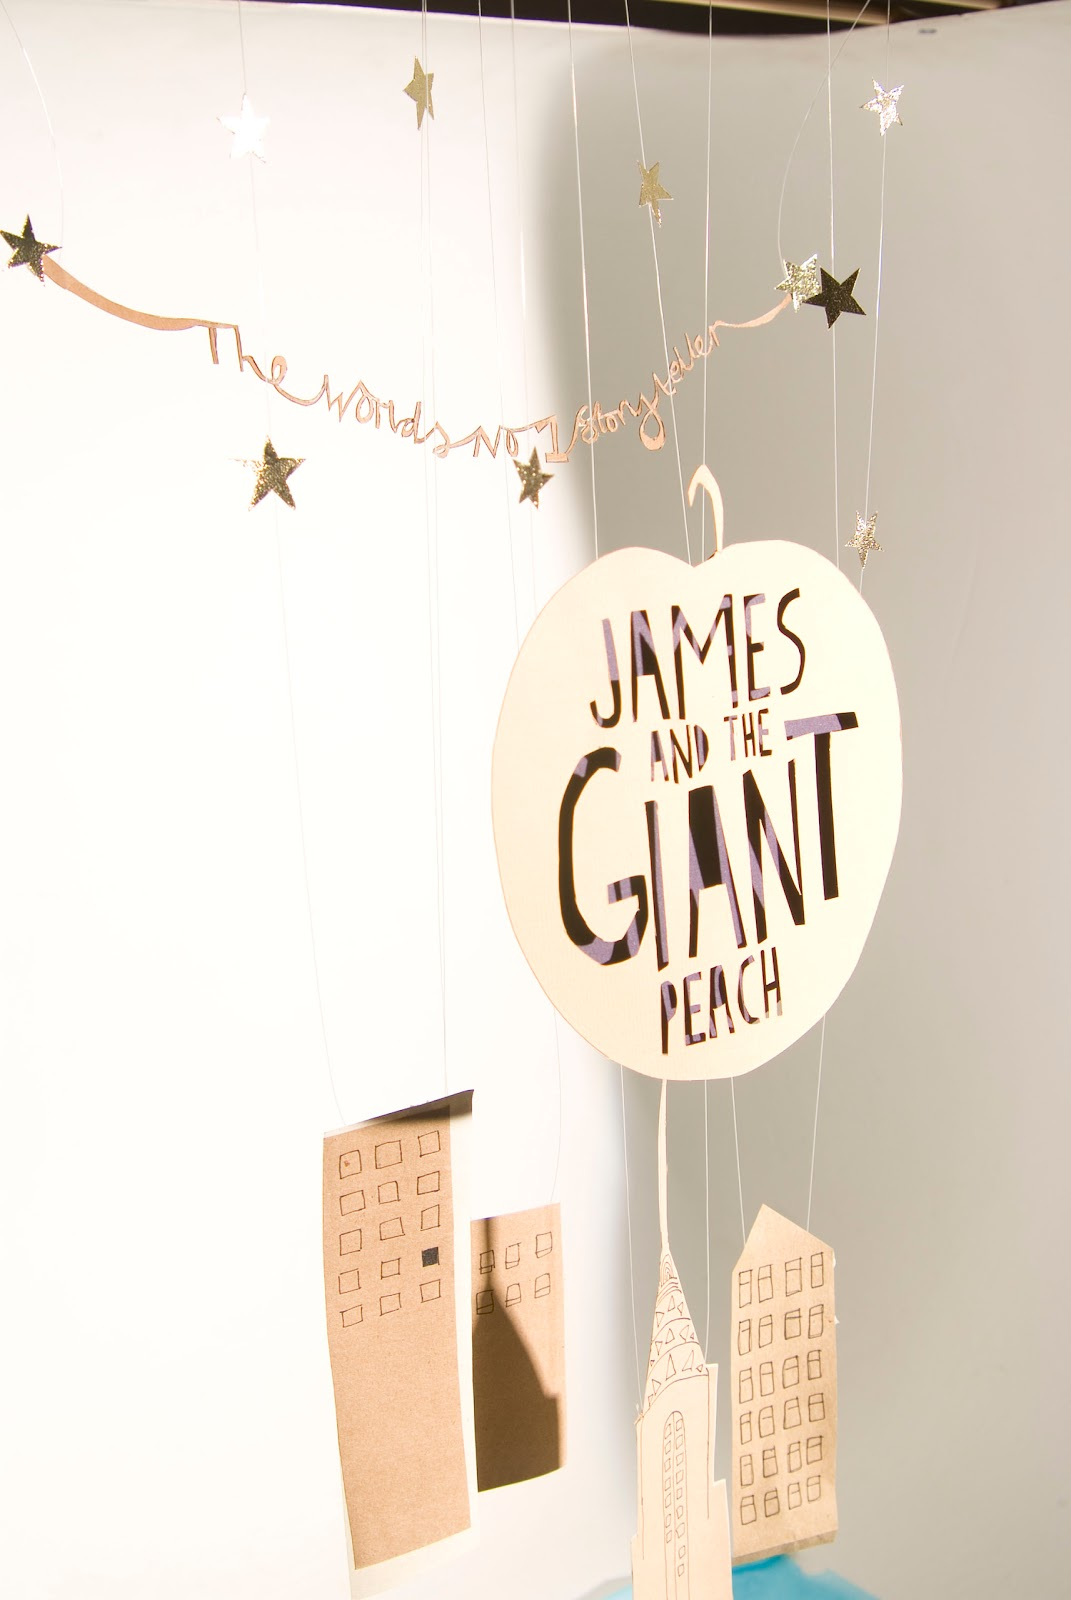 Lisa Rockall Penguin Design Award Book Cover For James And The Giant Peach